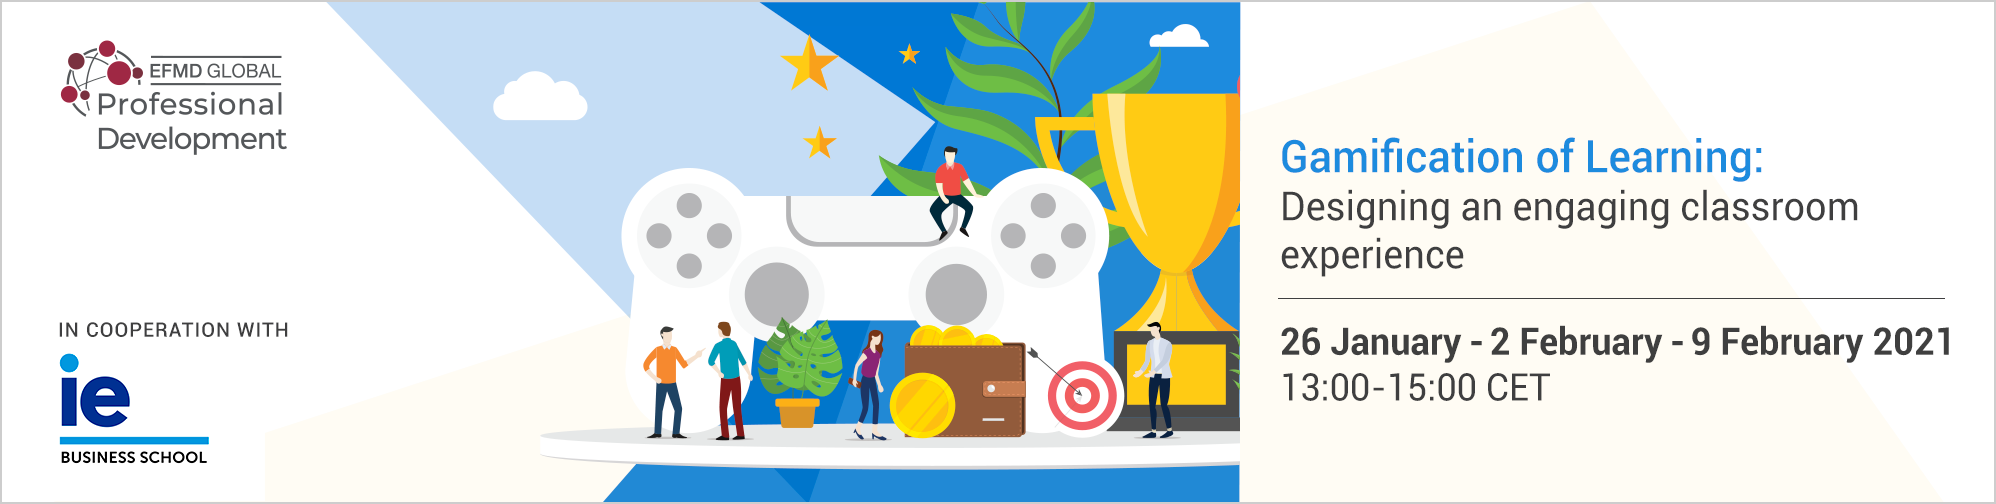 2021-EFMD-Gamification-of-Learning-website